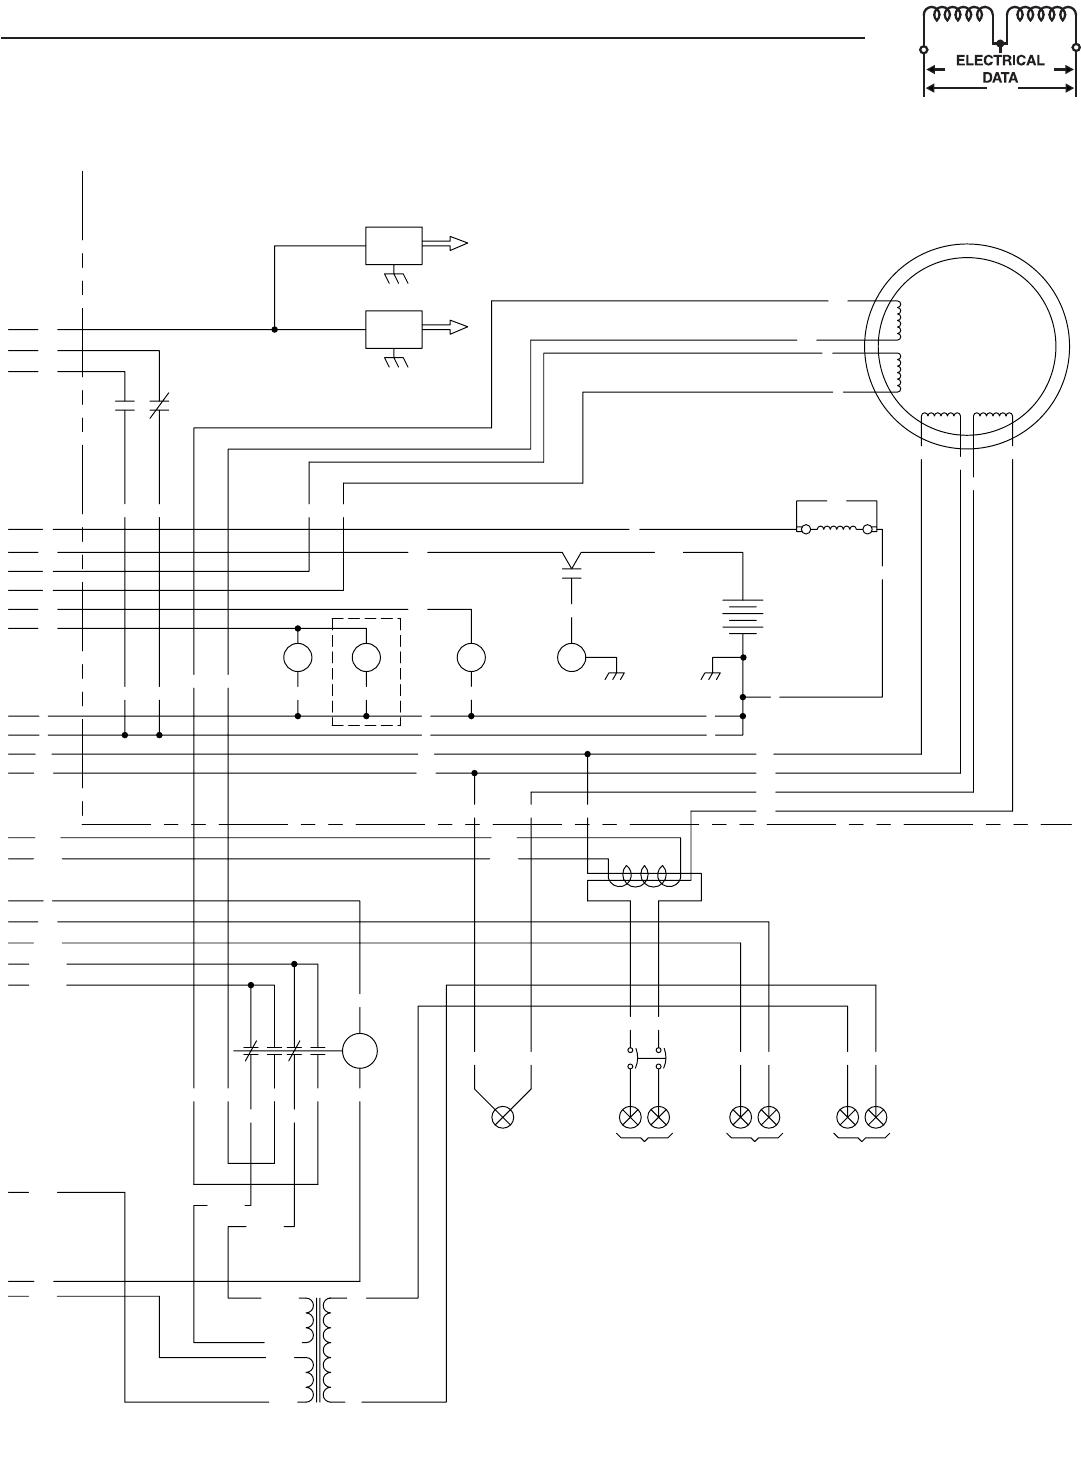 generac engine wiring diagram generac power systems 5251  5252  5253  5254  5255 engine and  generac power systems 5251  5252  5253